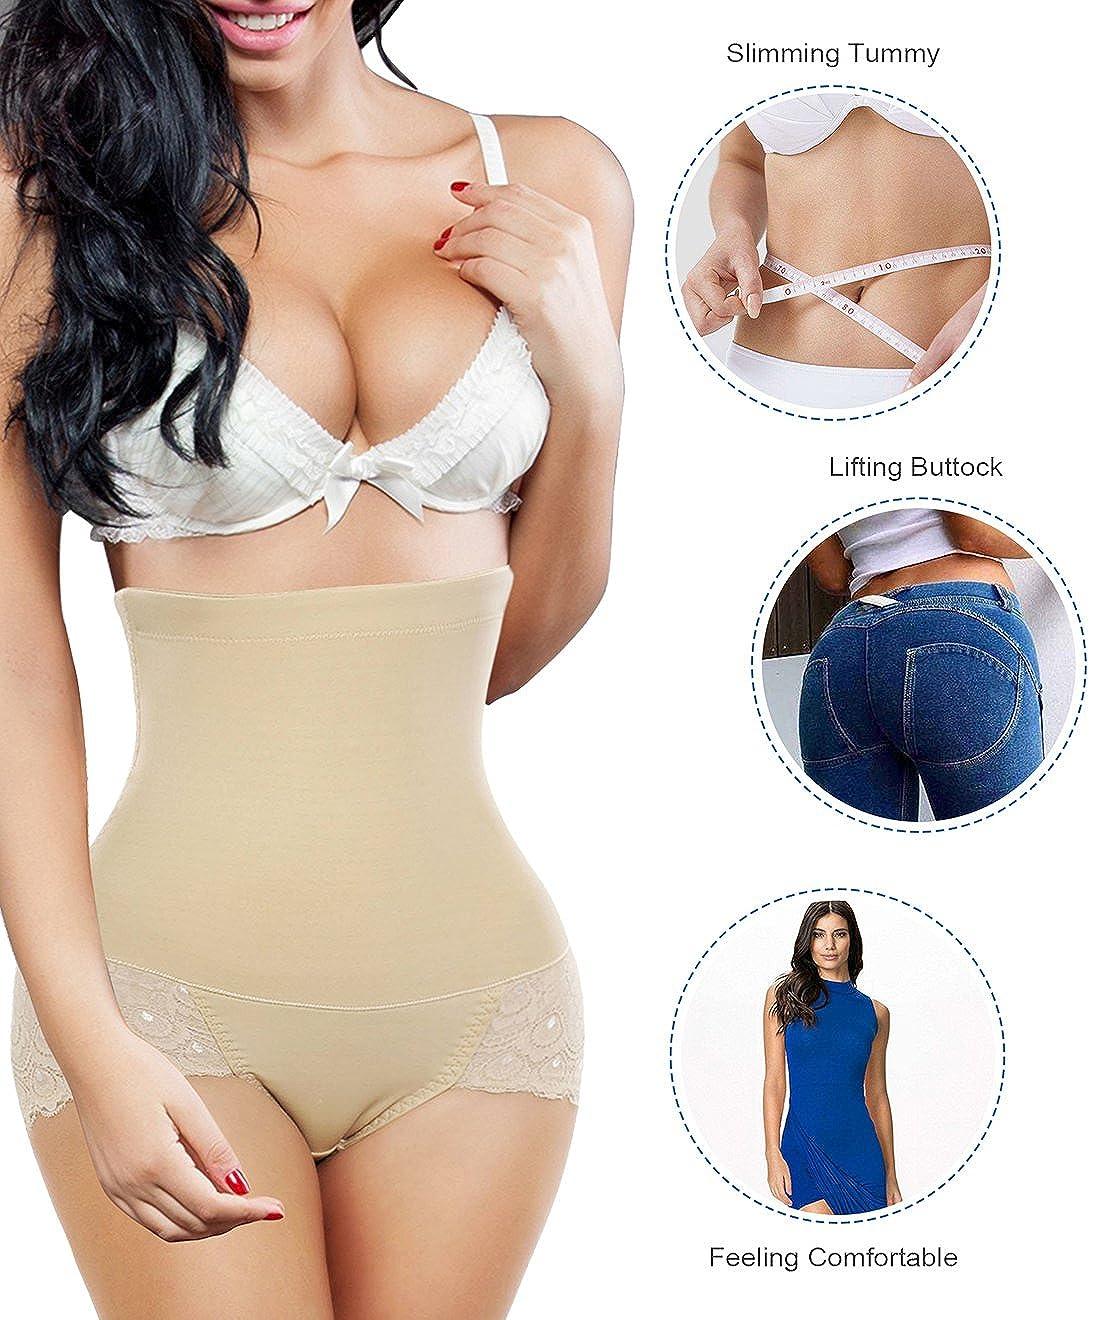 722225b89a Nebility Women Butt Lifter Shapewear Seamless Waist Trainer Hi-Waist Tummy  Control Body Shaper Panty